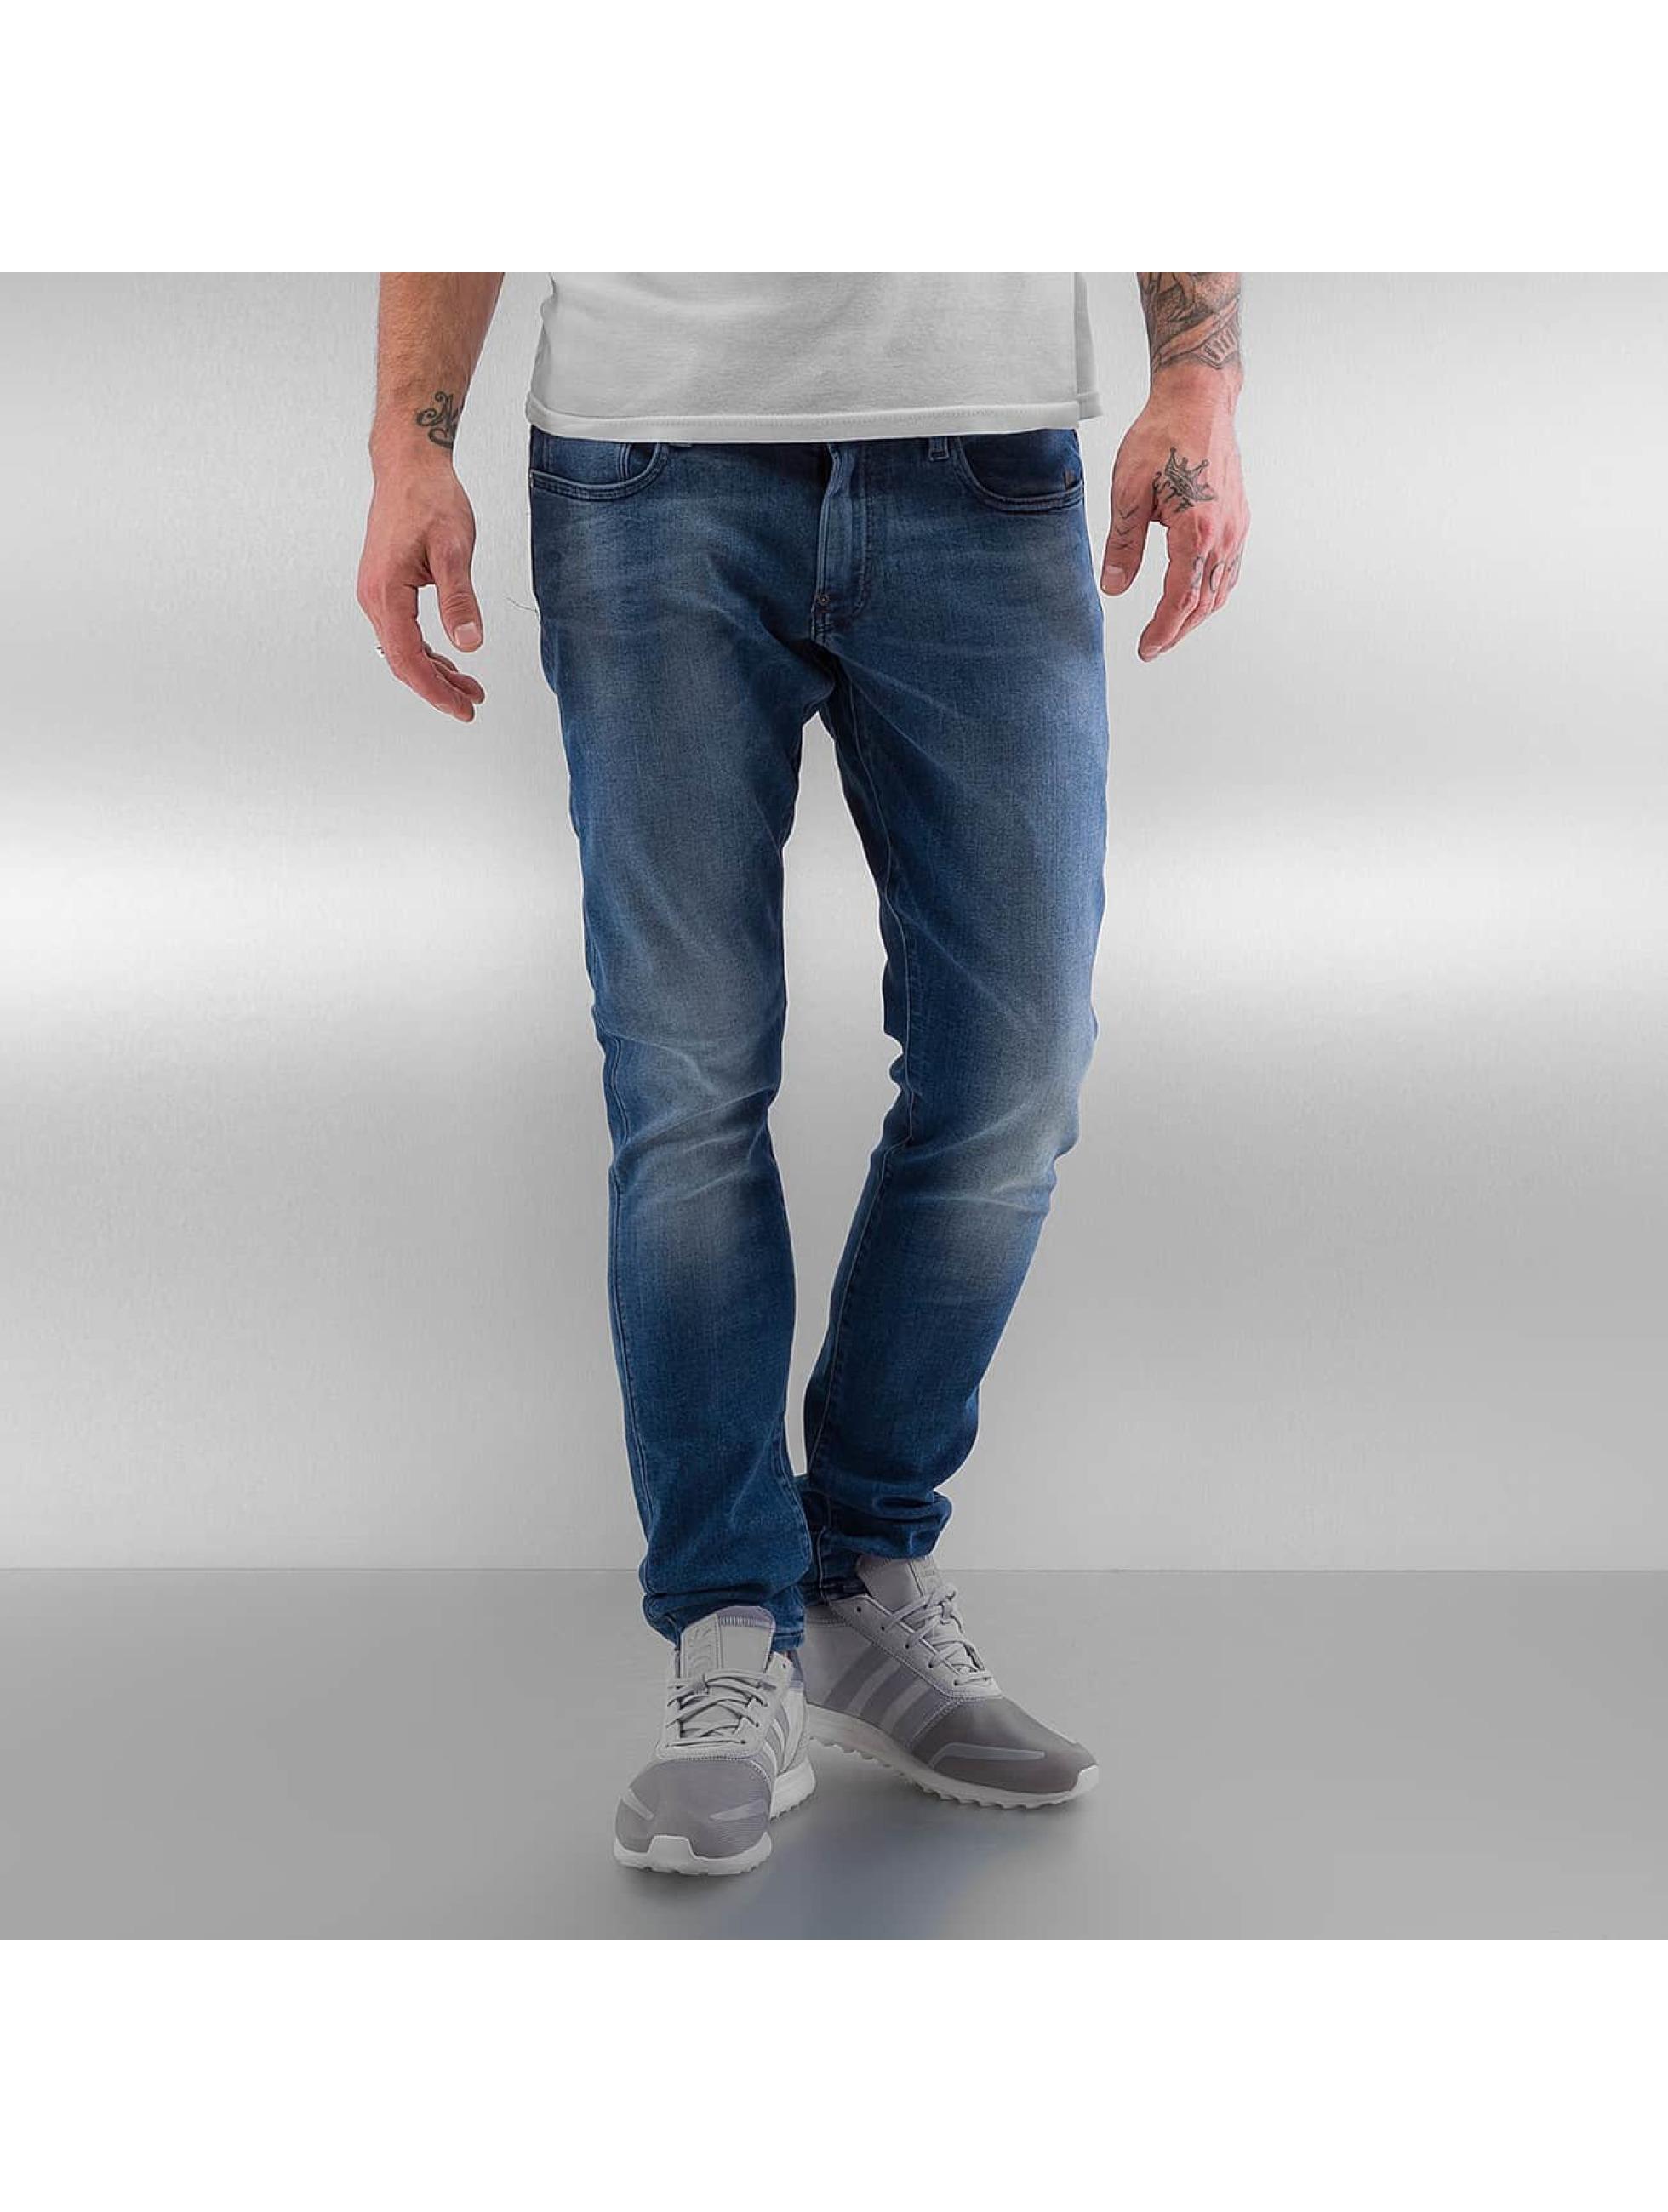 G-Star Skinny Jeans Revend Super Slim Slander blau